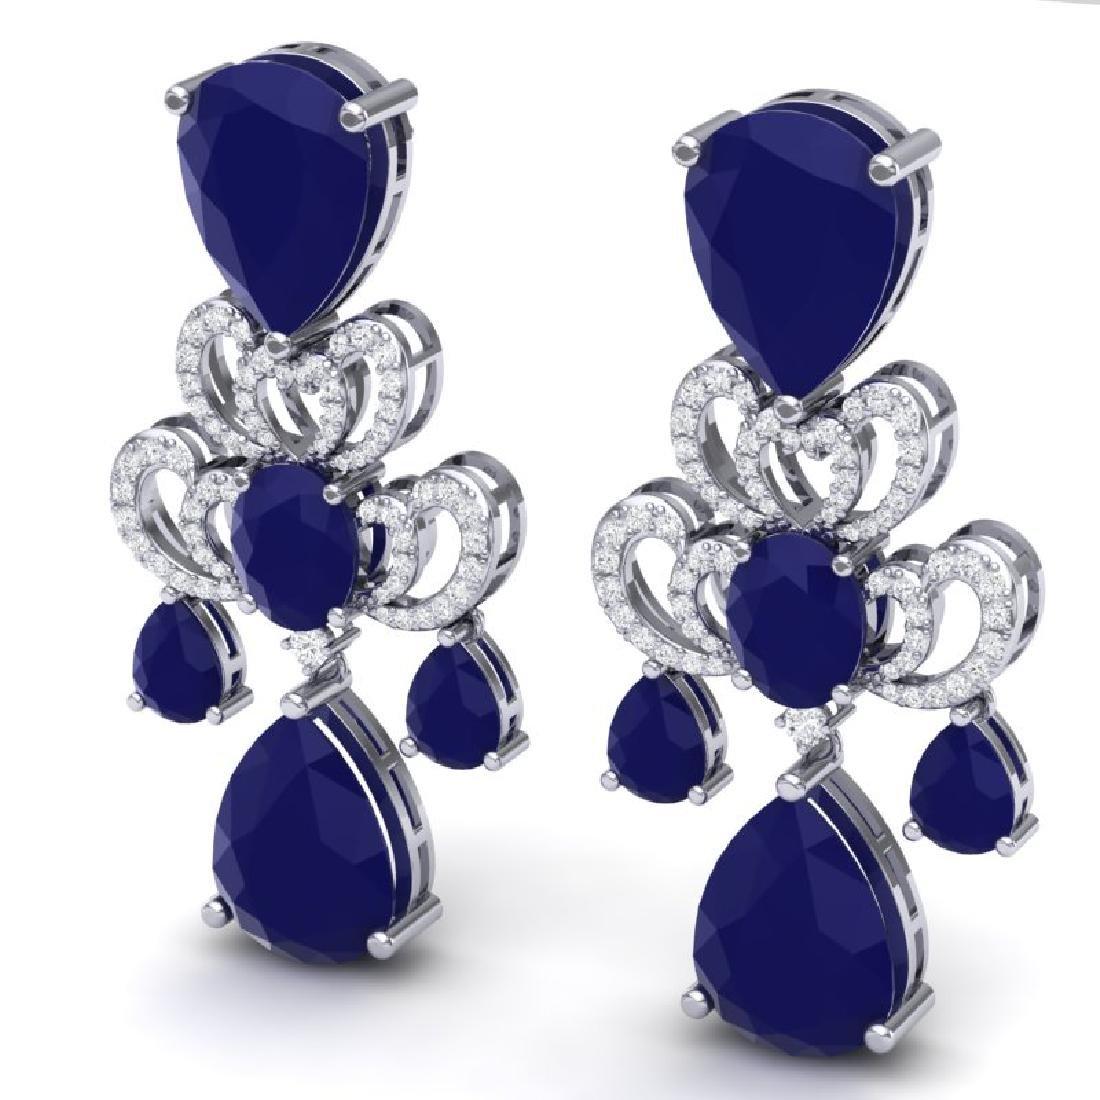 58.73 CTW Royalty Sapphire & VS Diamond Earrings 18K - 2